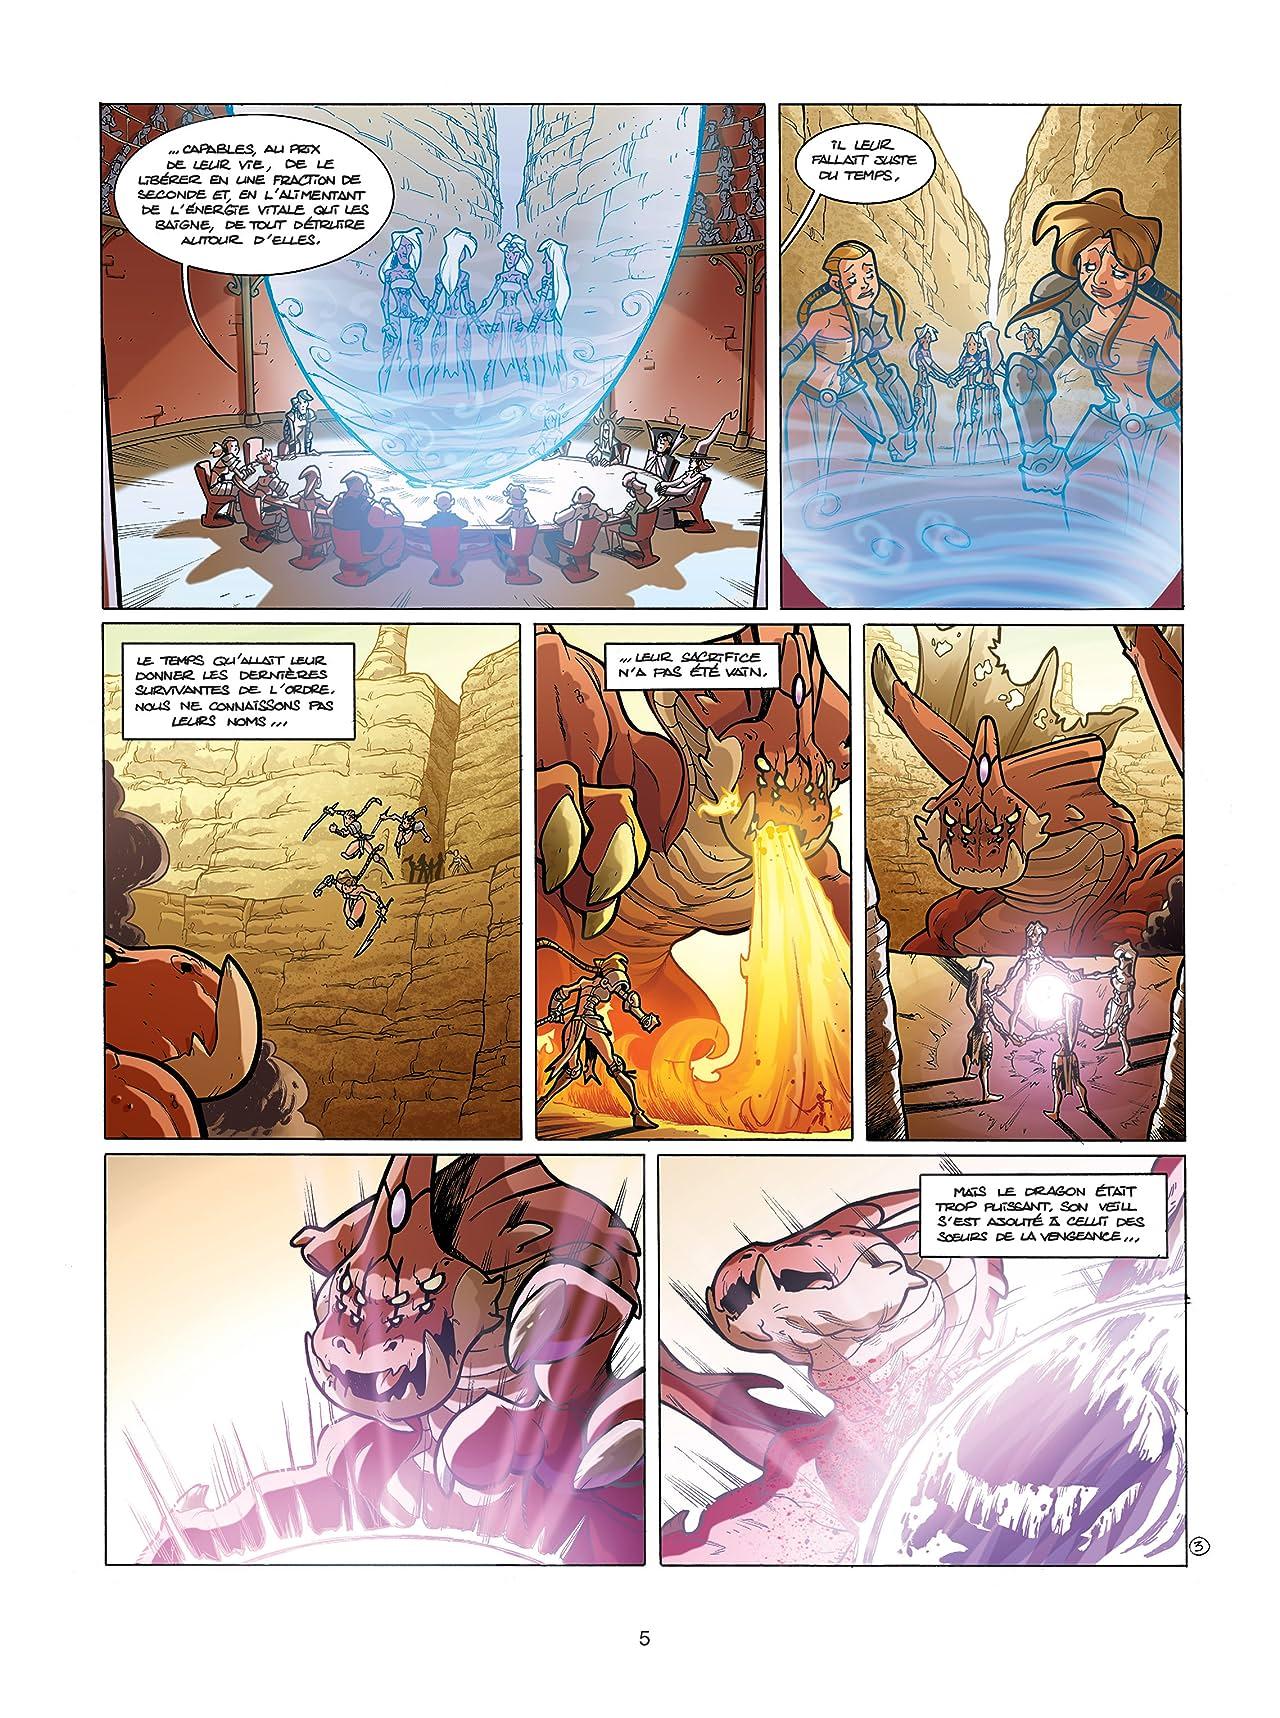 Le Collège invisible Vol. 6: Galactus destructor